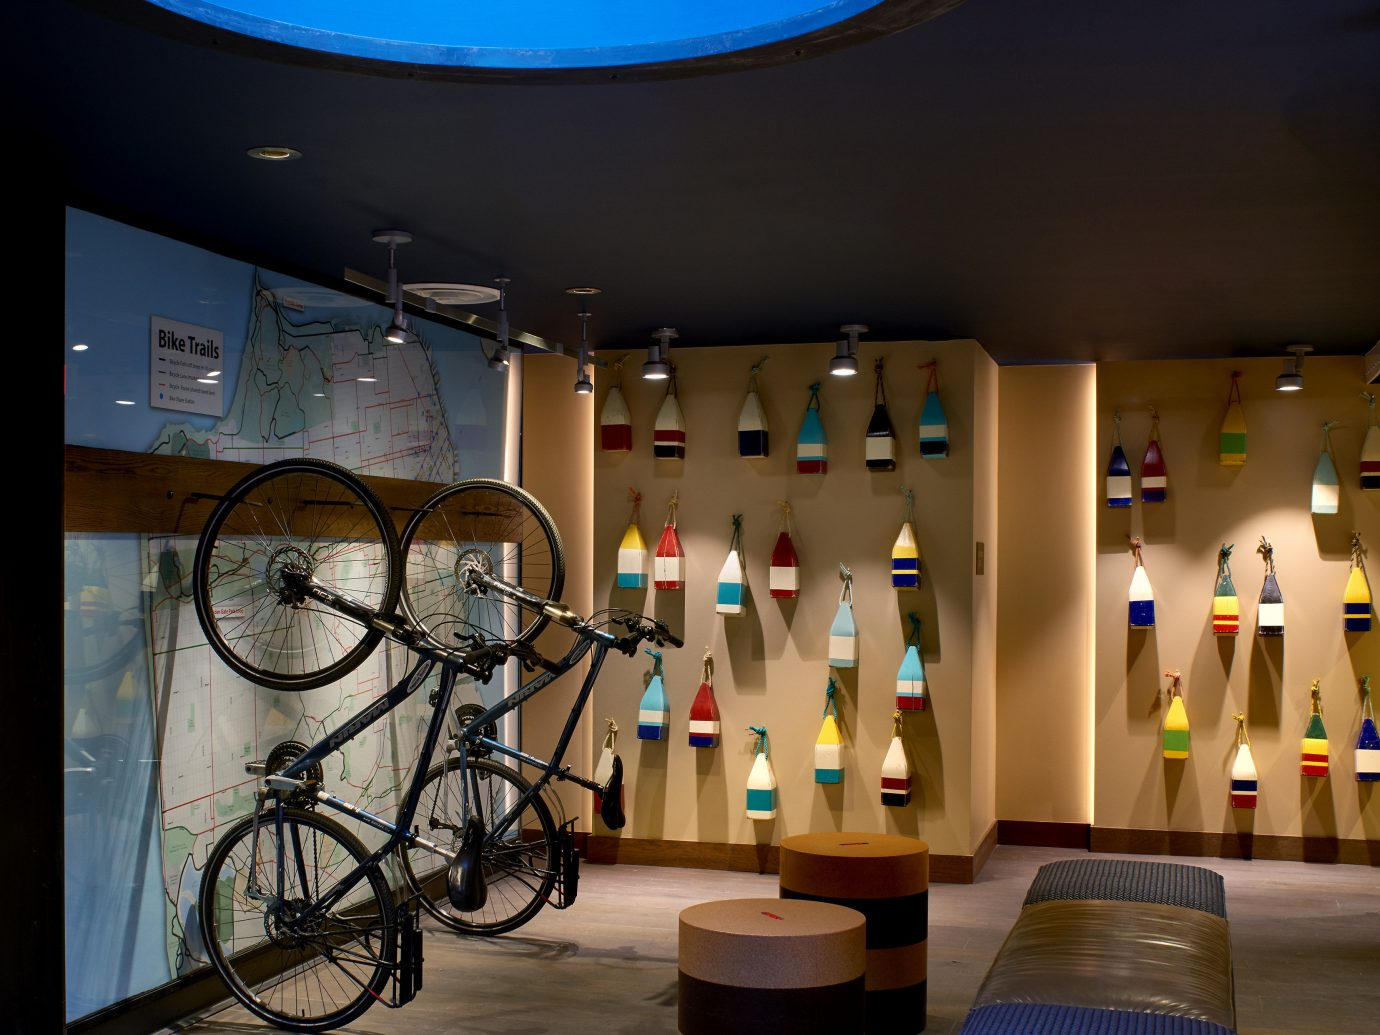 Hotels ceiling indoor interior design Design Lobby tourist attraction